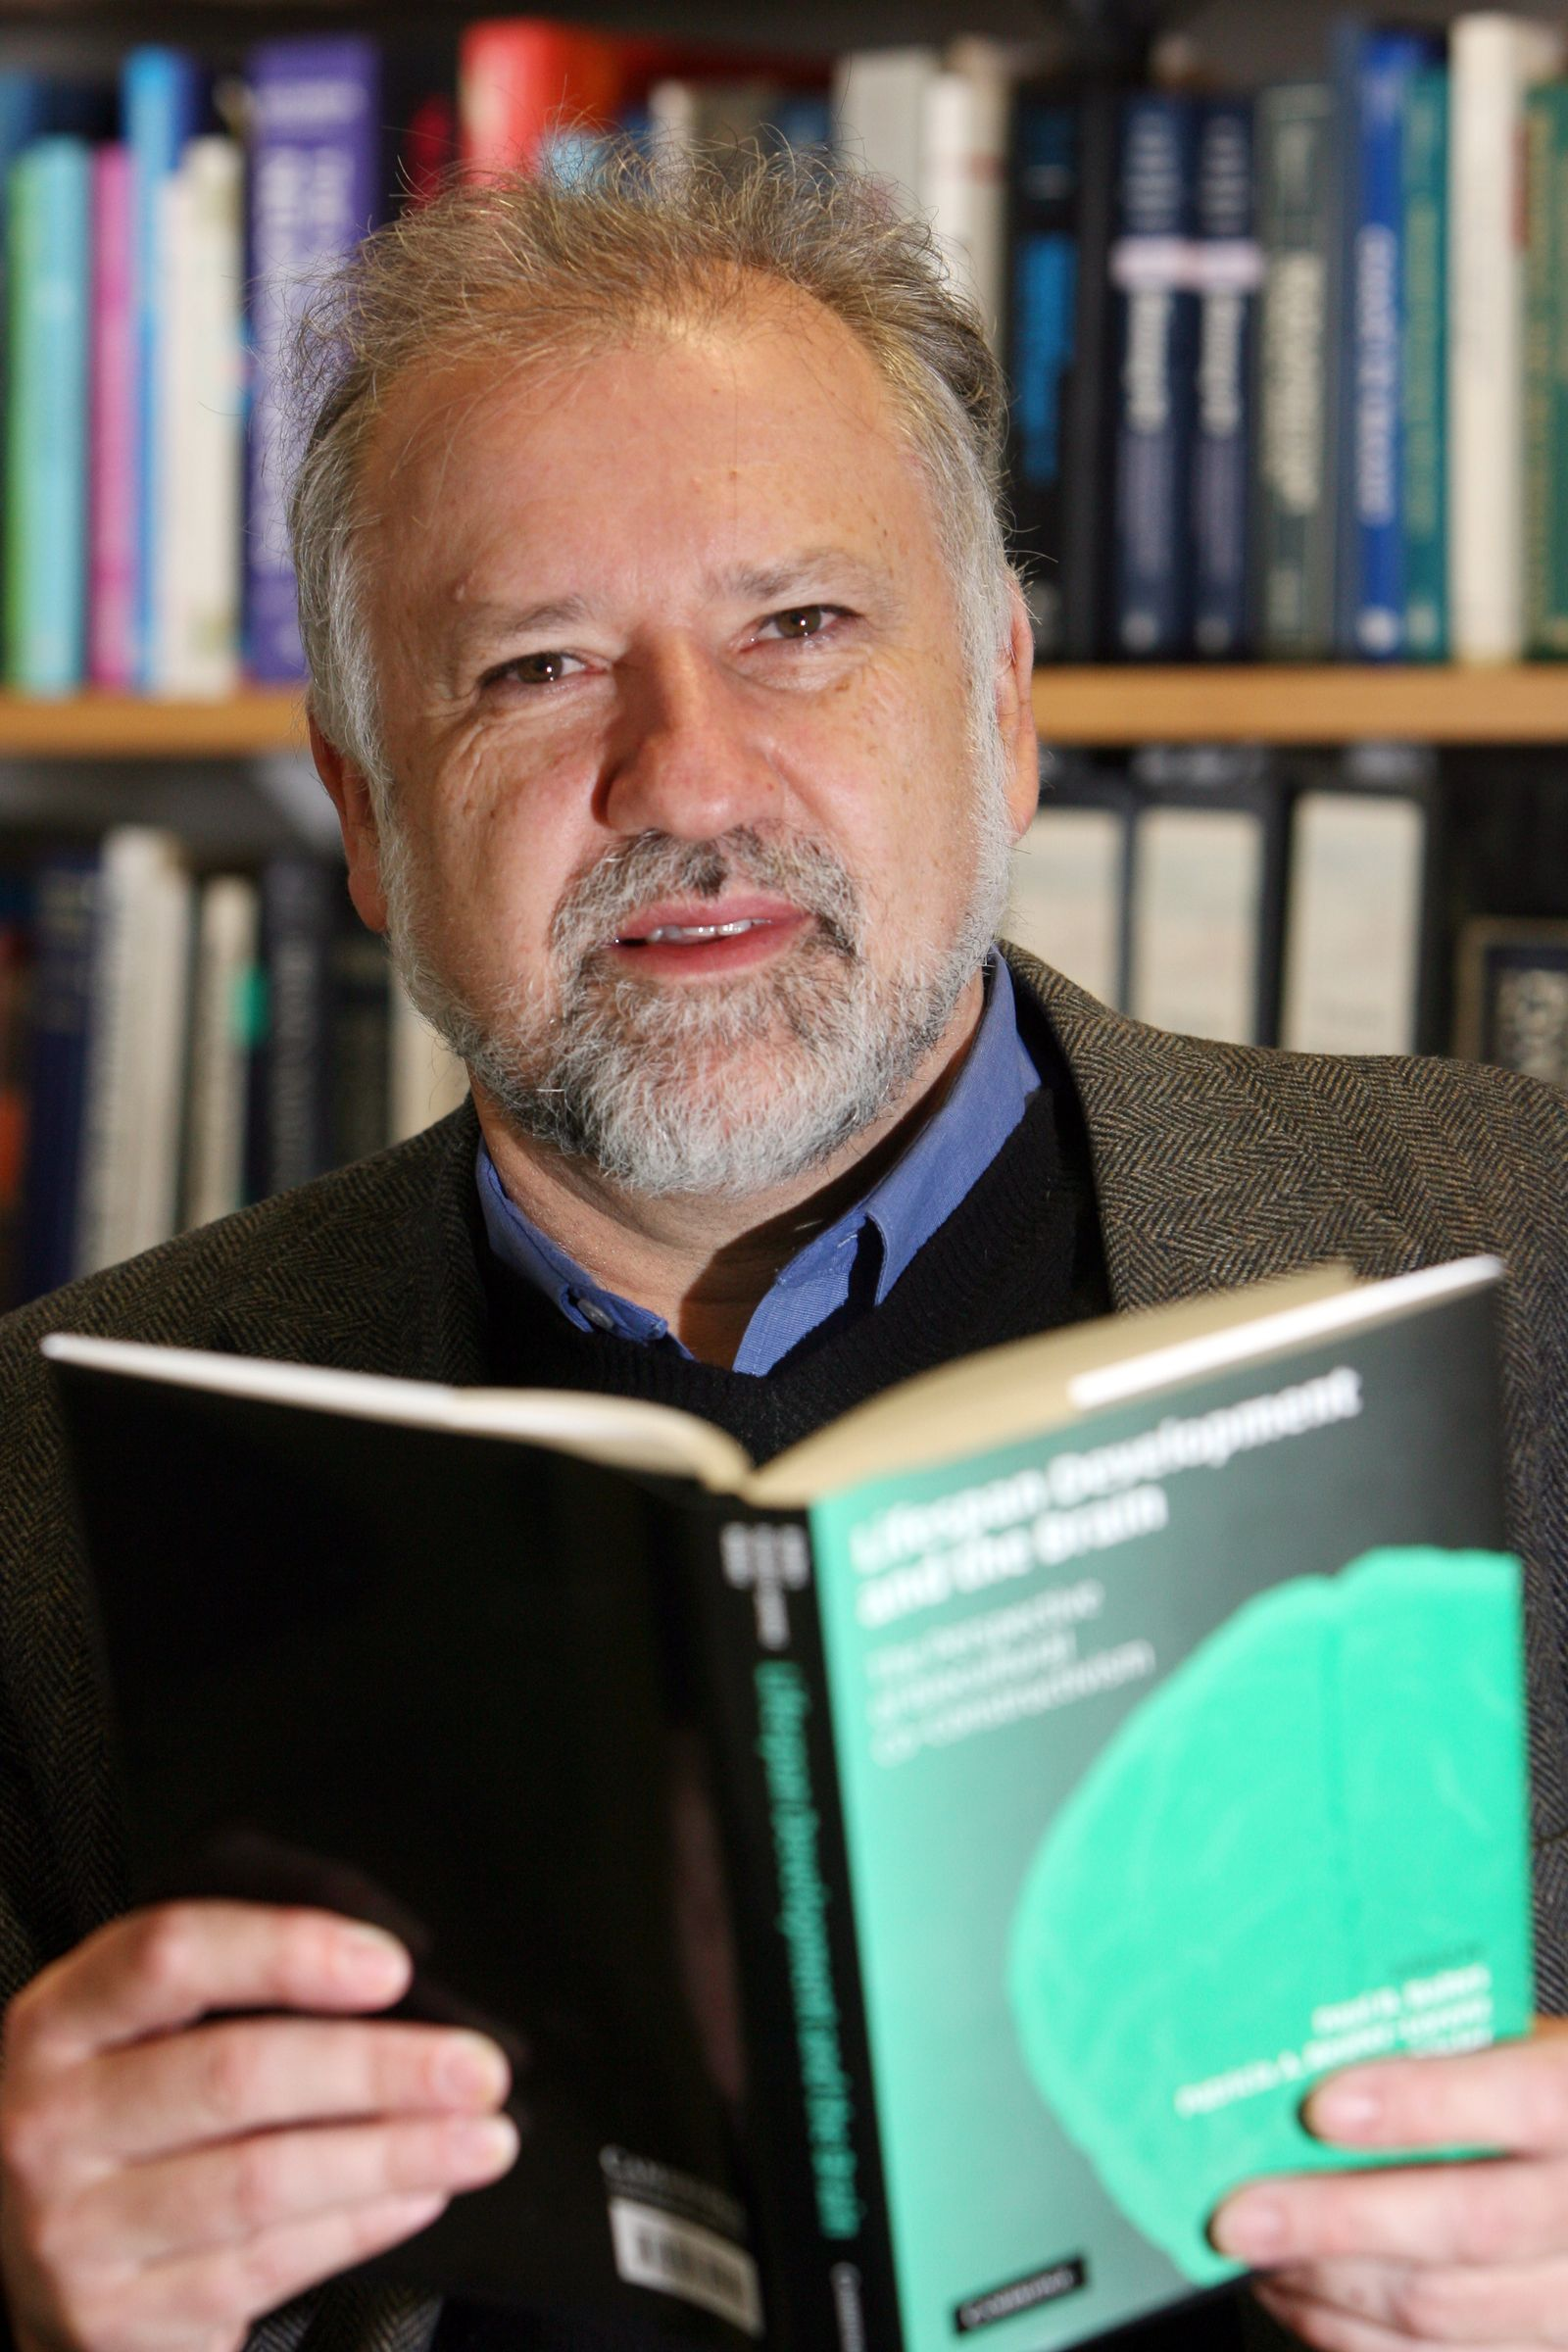 Thomas Elbert